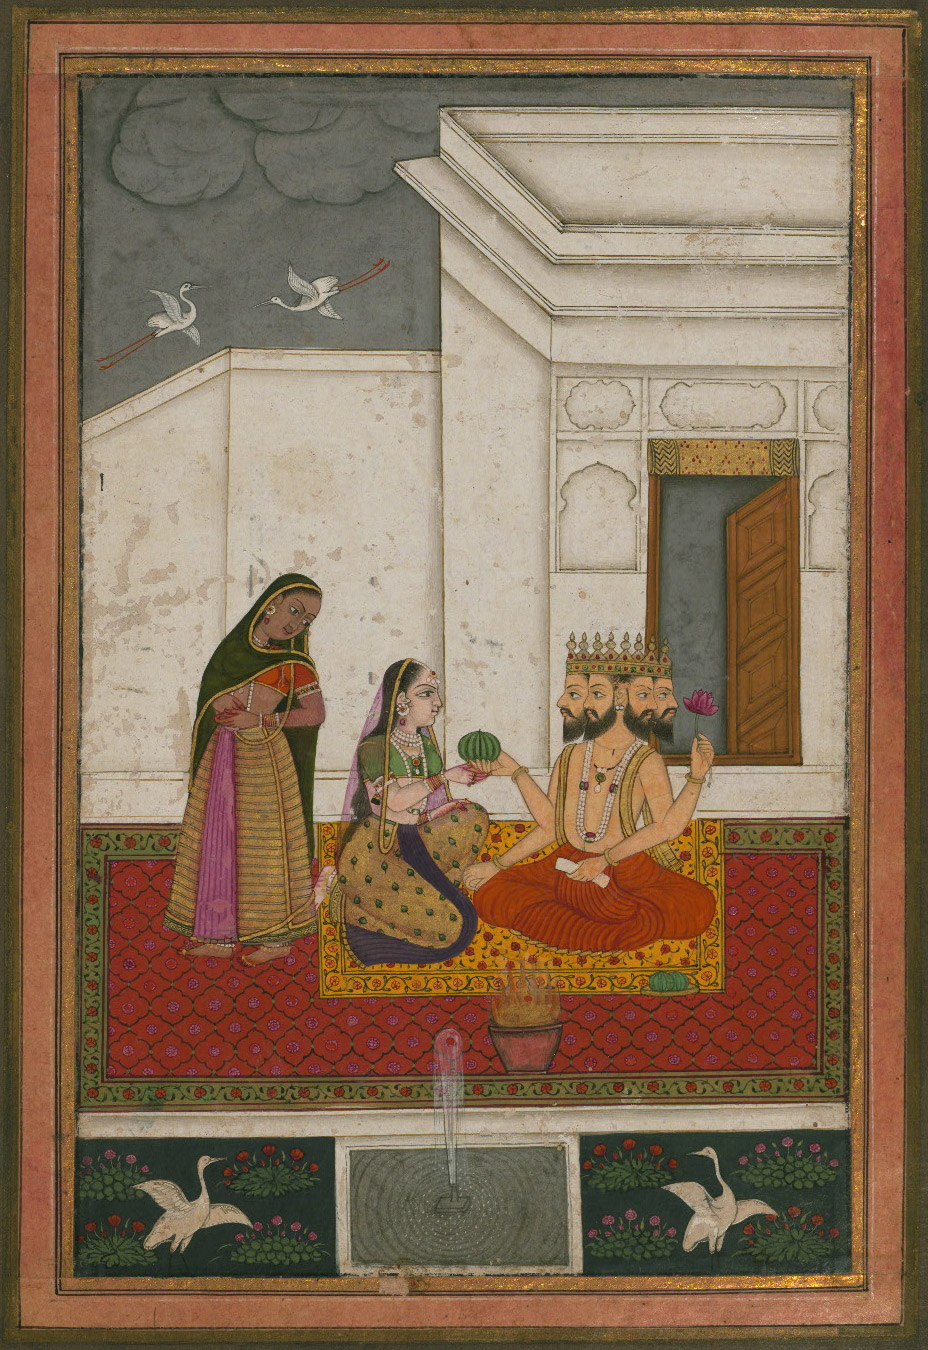 Khambhavati Ragini  - Miniature Painting, Deccan School, Ragamala series, 19th Century